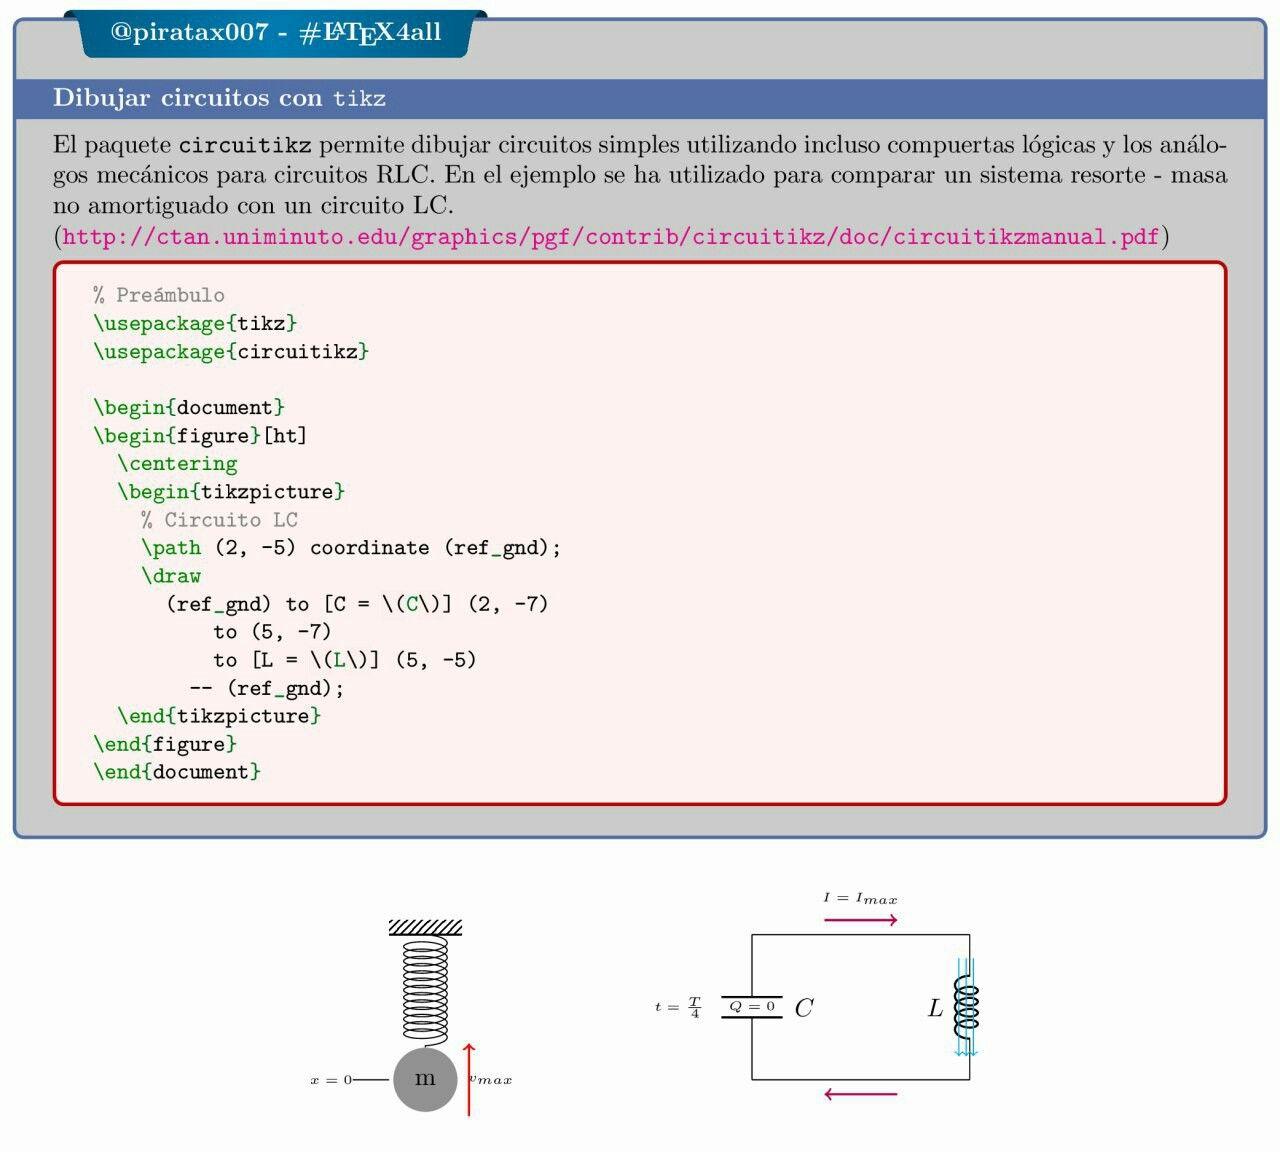 Circuito Rlc : Circuitos rlc corriente alterna pdf application wiring diagram u